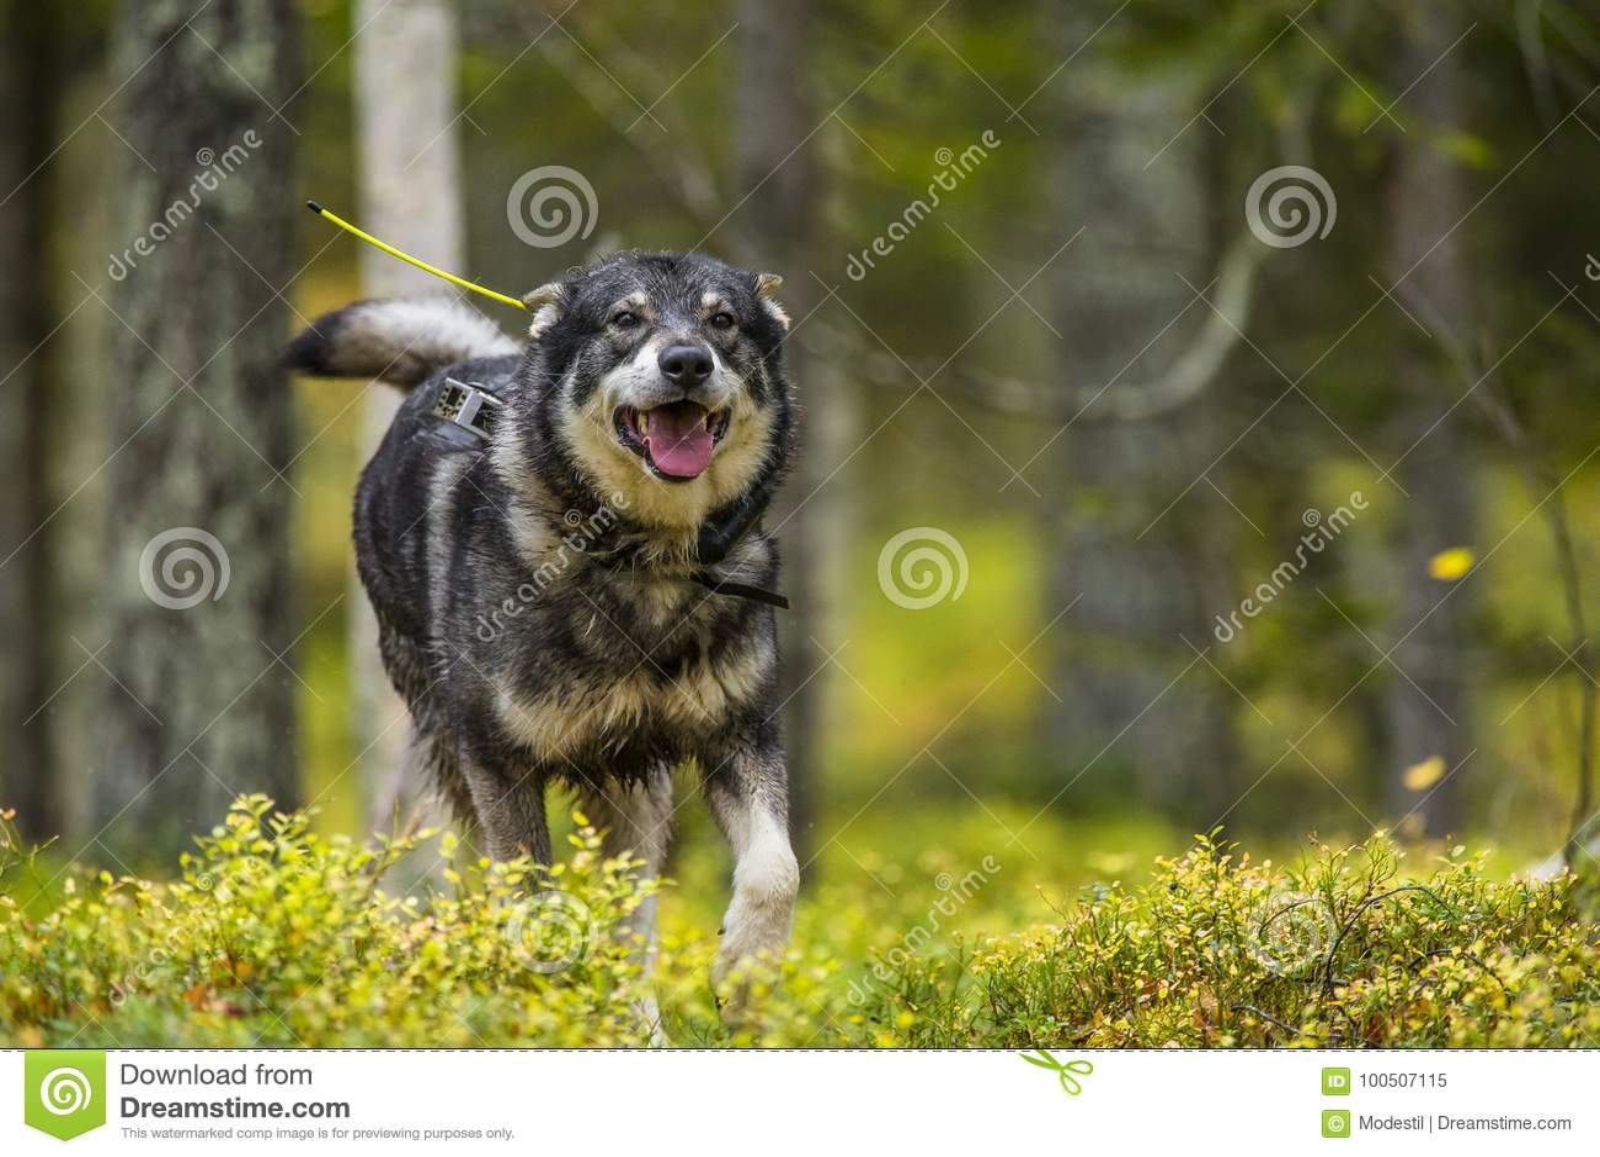 Swedish Moosehound in the fall